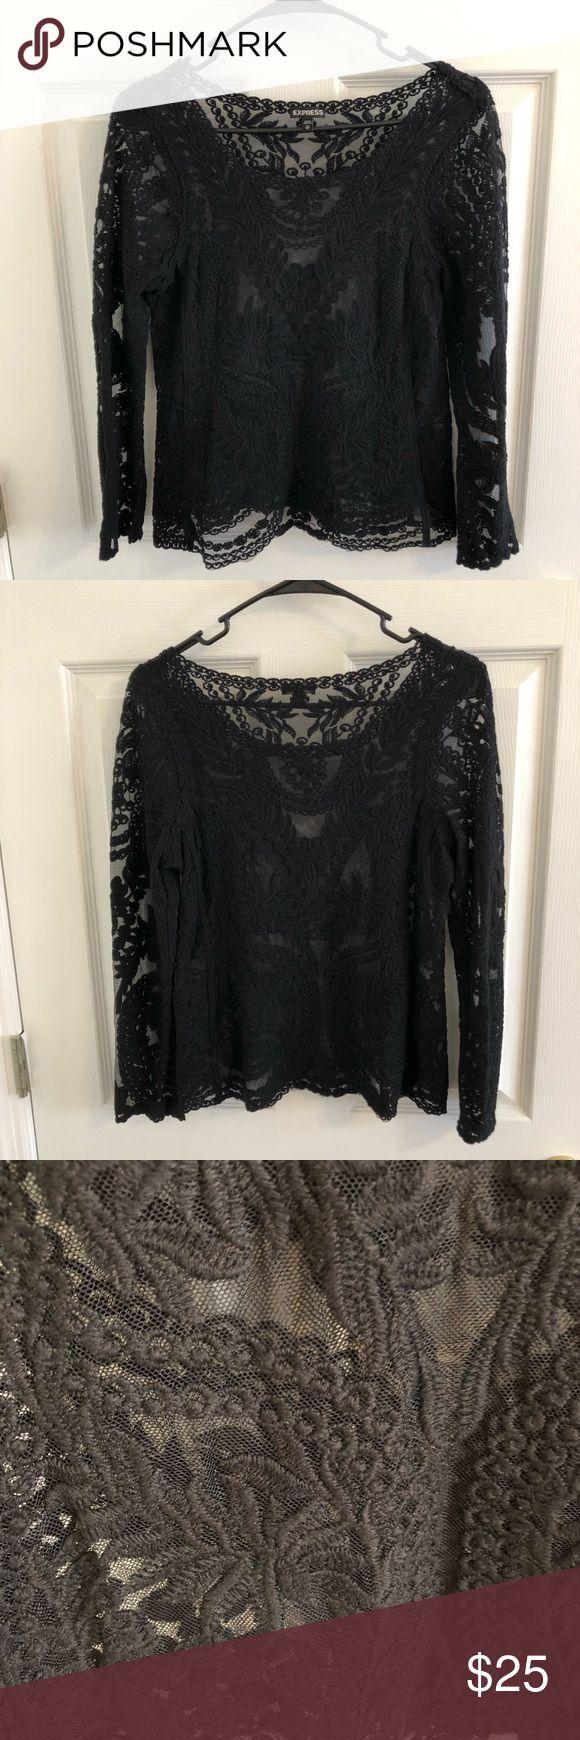 Express Sheer Black Crochet Top XS Beautiful sheer black crochet lace top from Express. Size XS. Express Tops Blouses